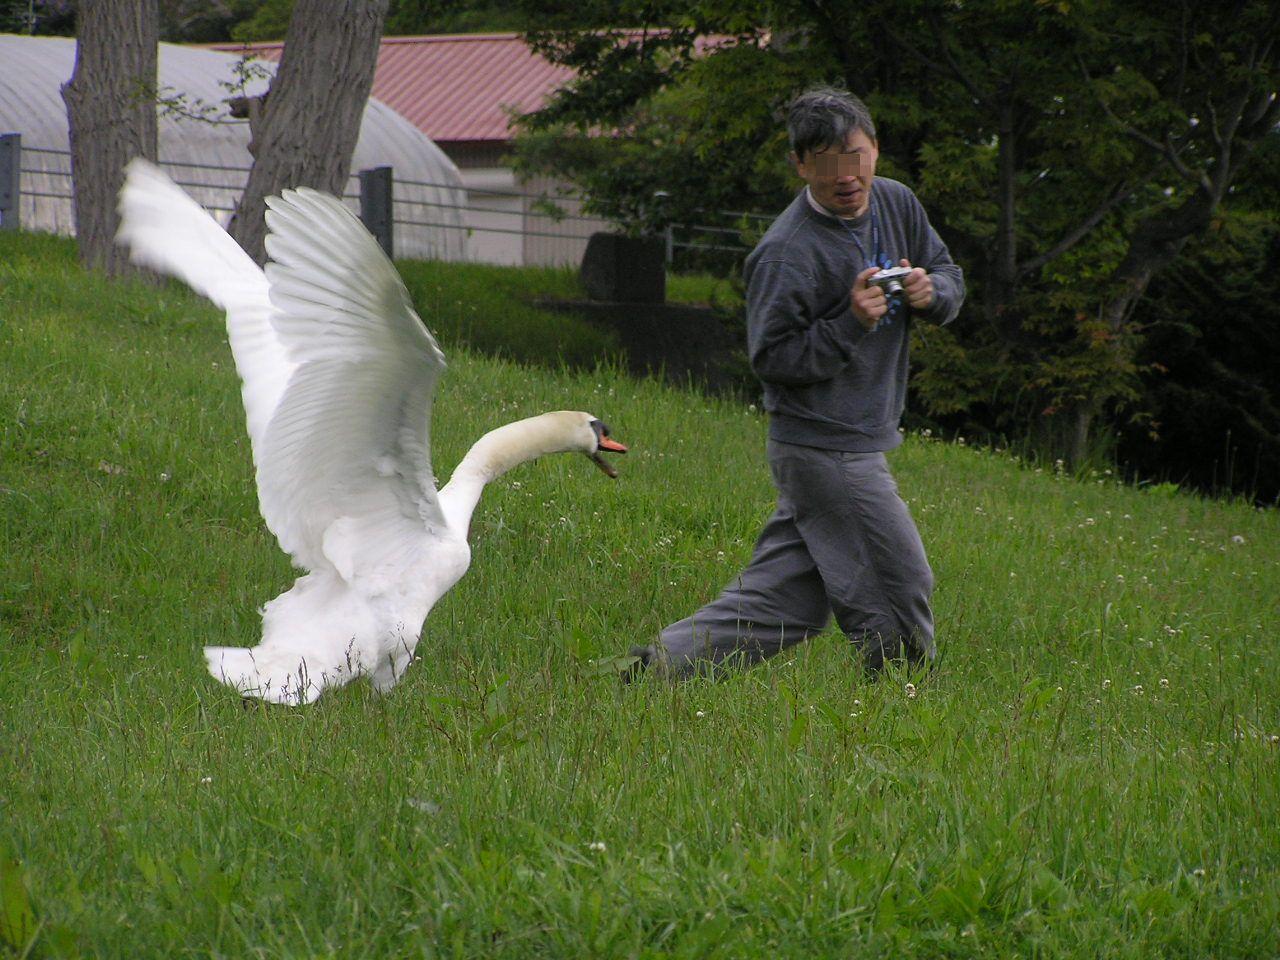 Нападение лебедя на человека